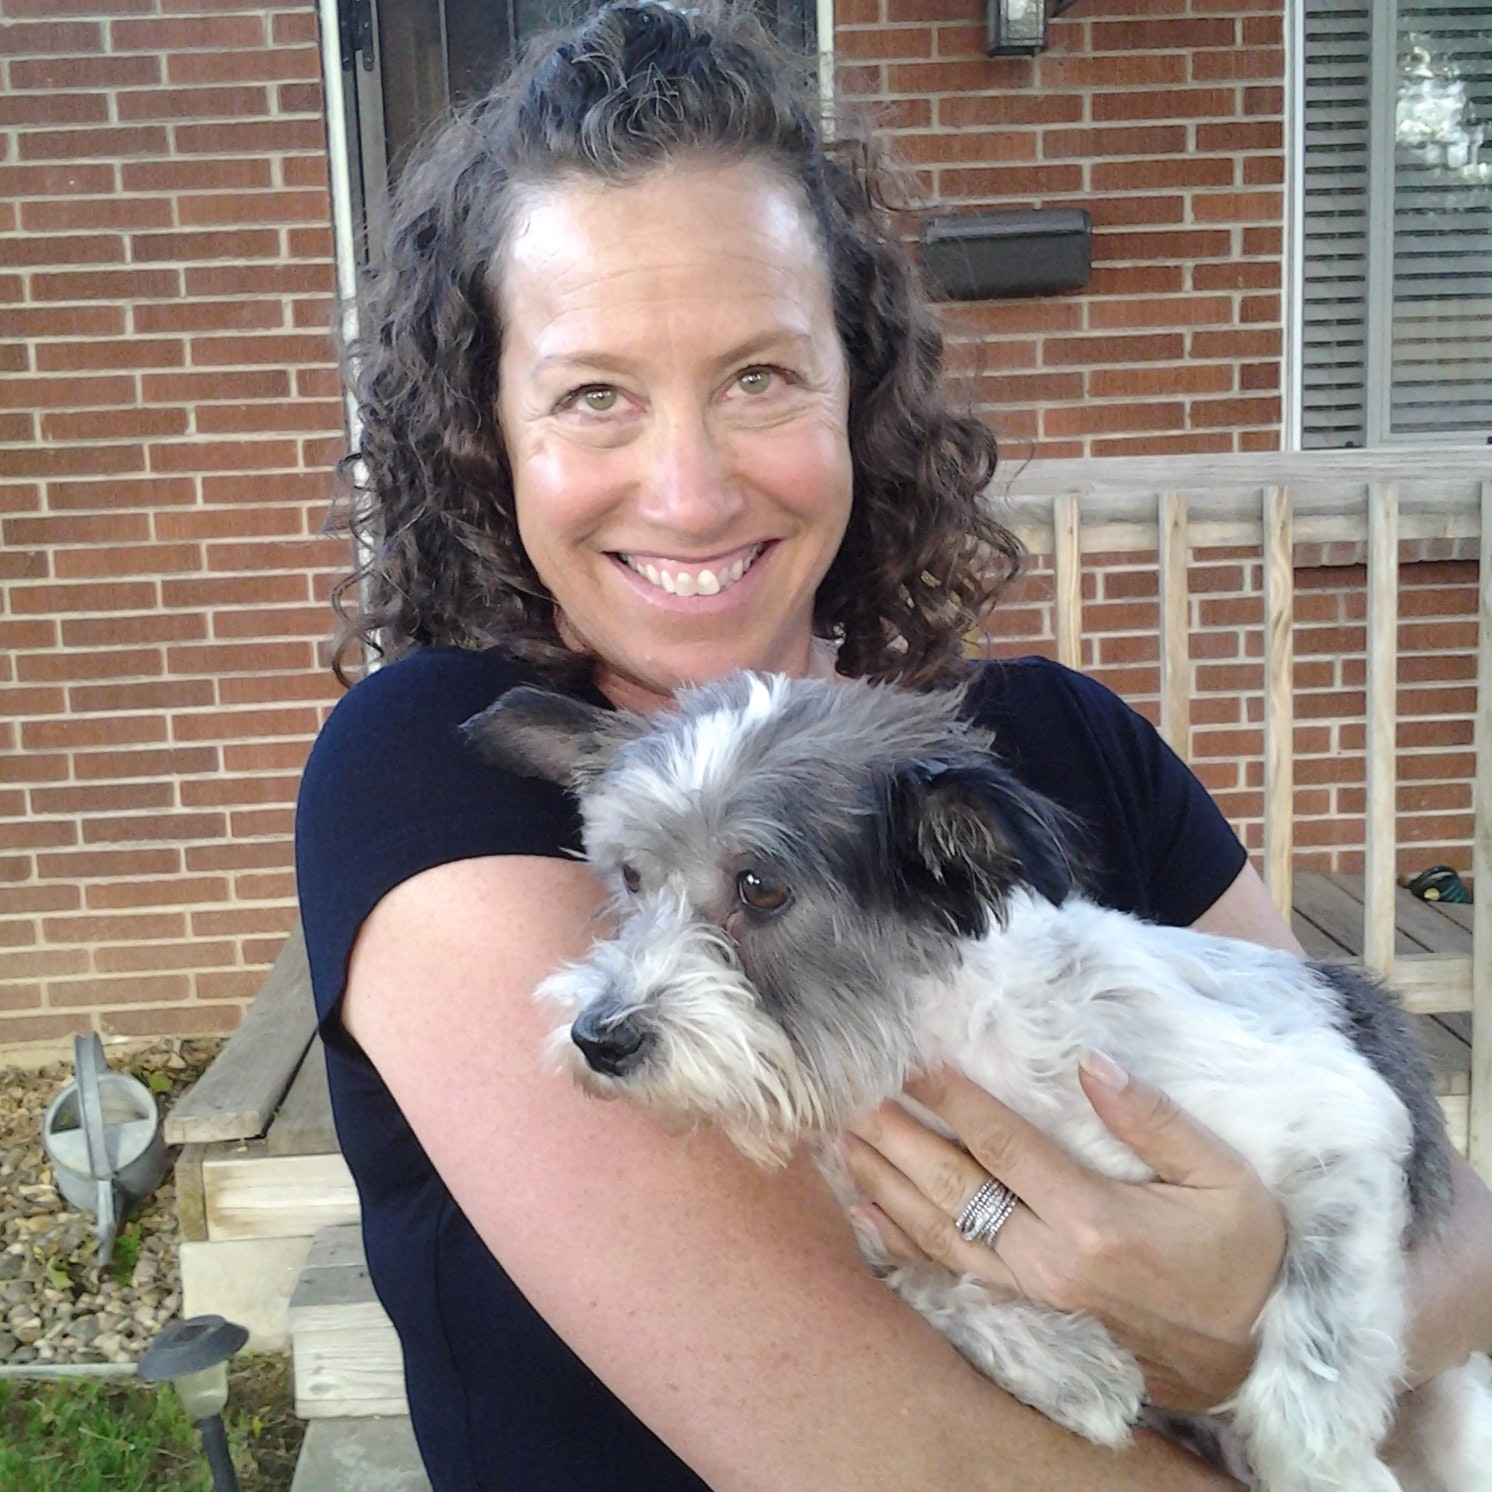 Deb's dog day care